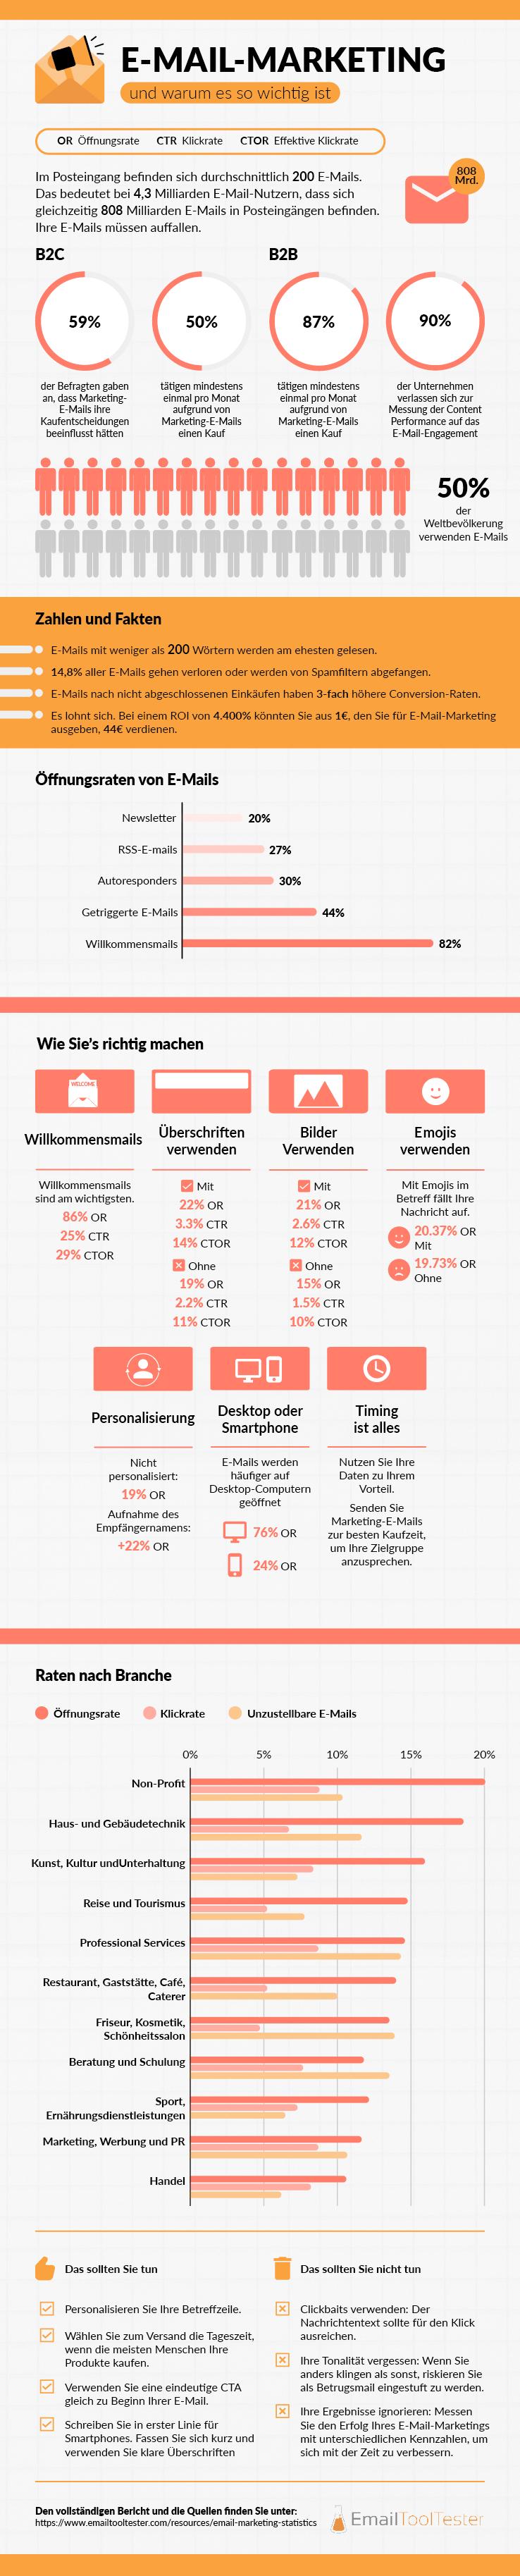 email marketing statistiken infografik